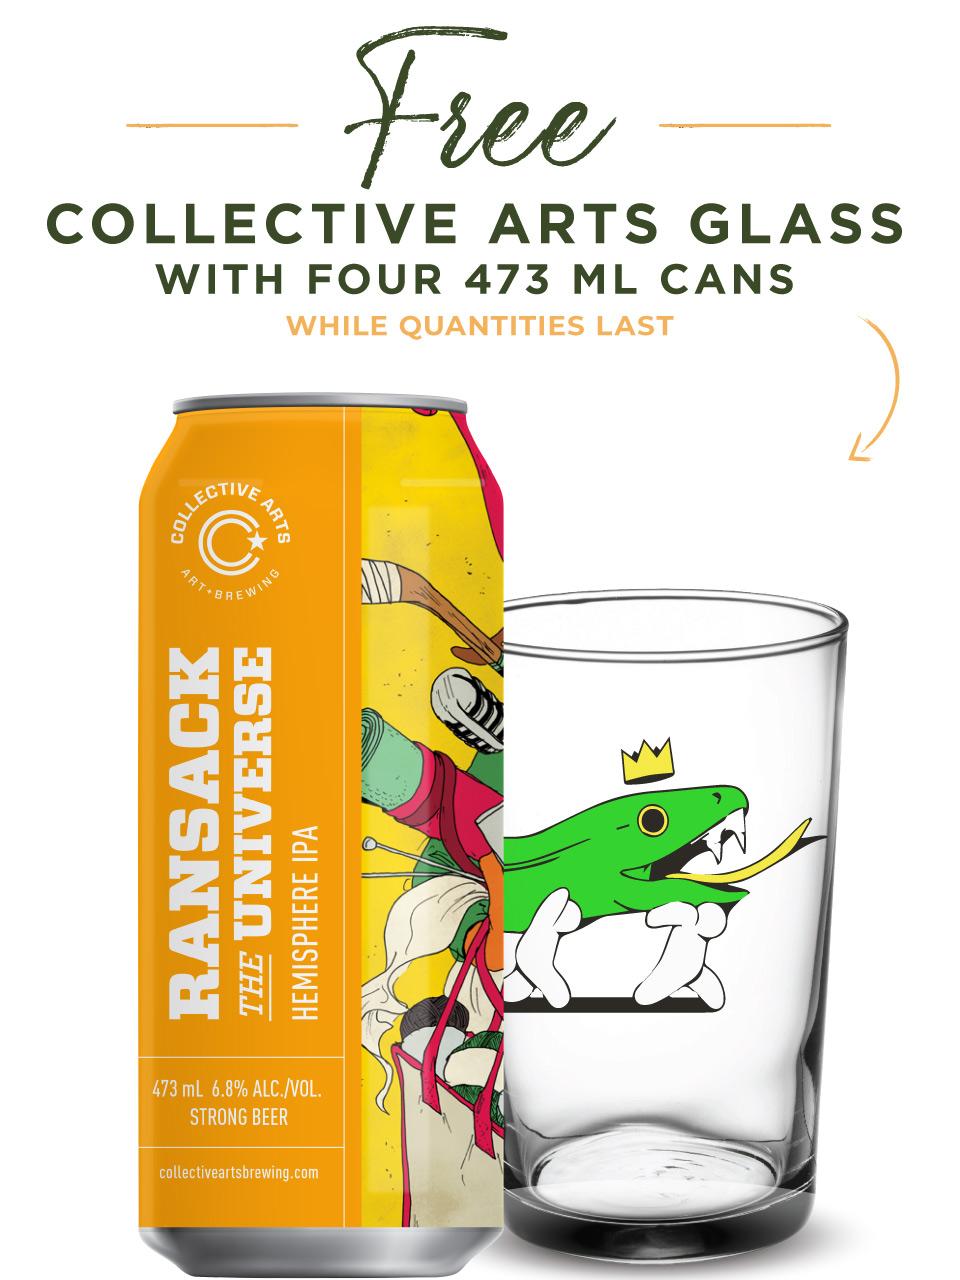 Collective Arts Ransack The Universe HemisphereIPA